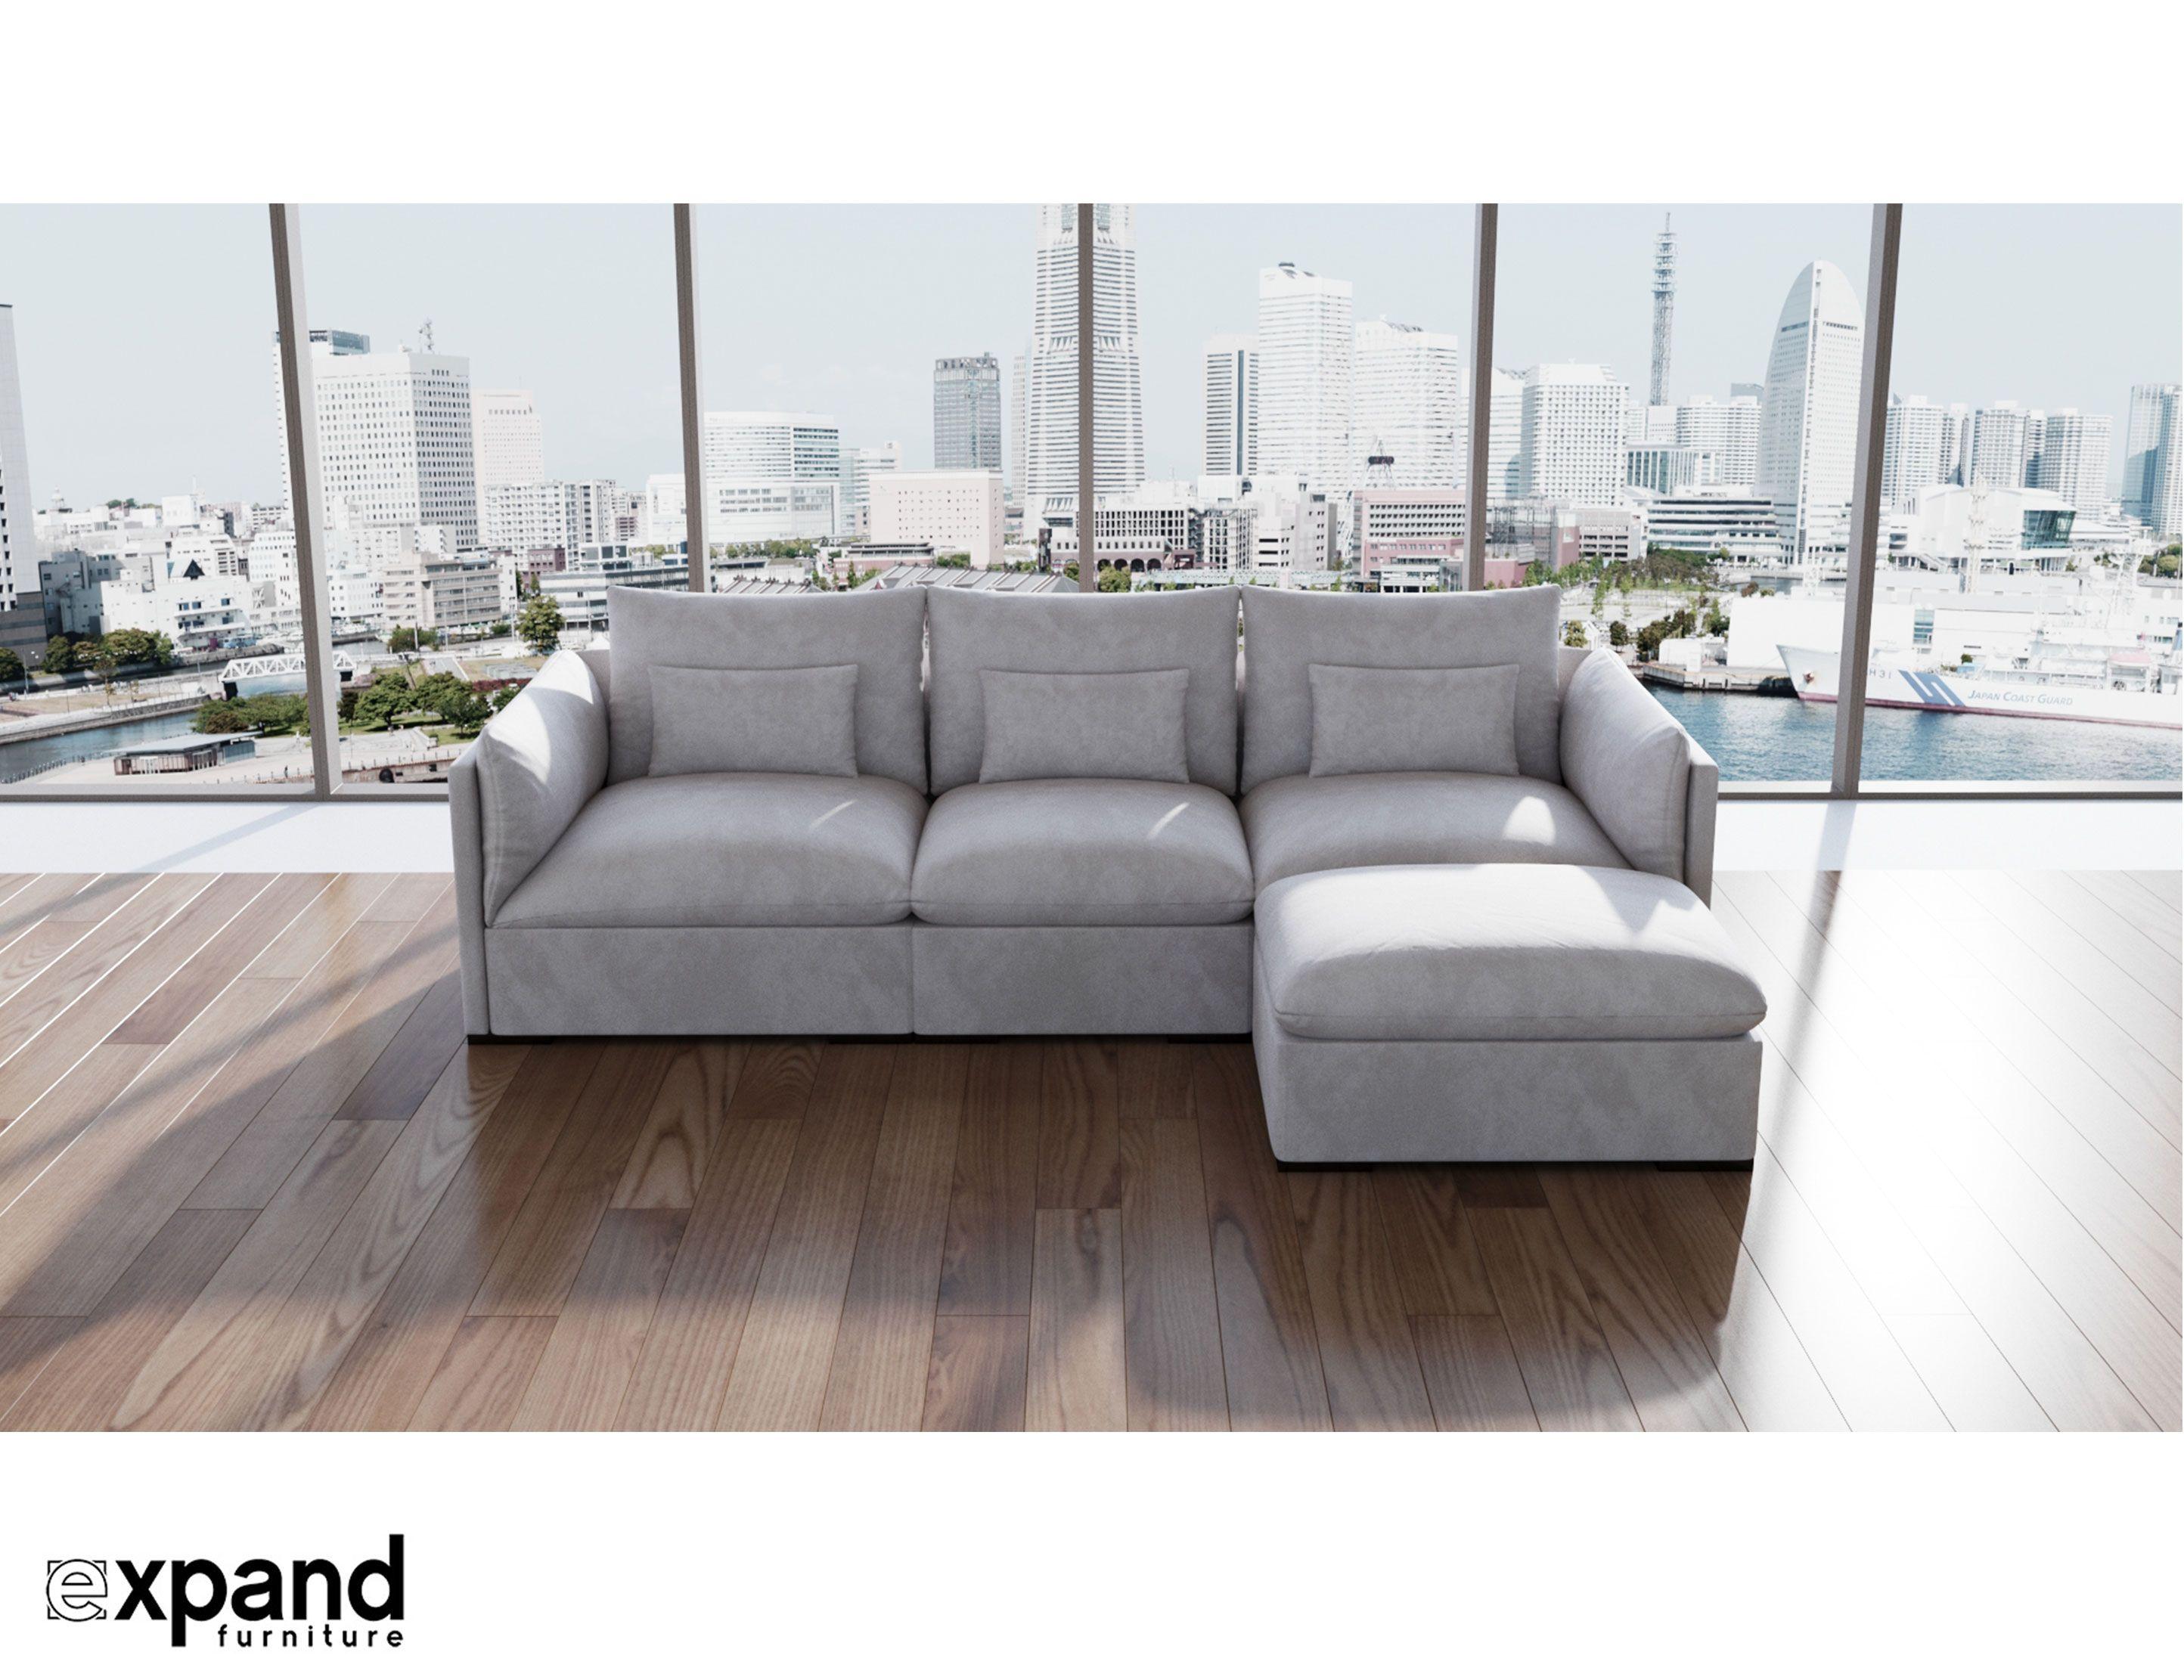 Pin by Expand Furniture on Modular Sofas Pinterest